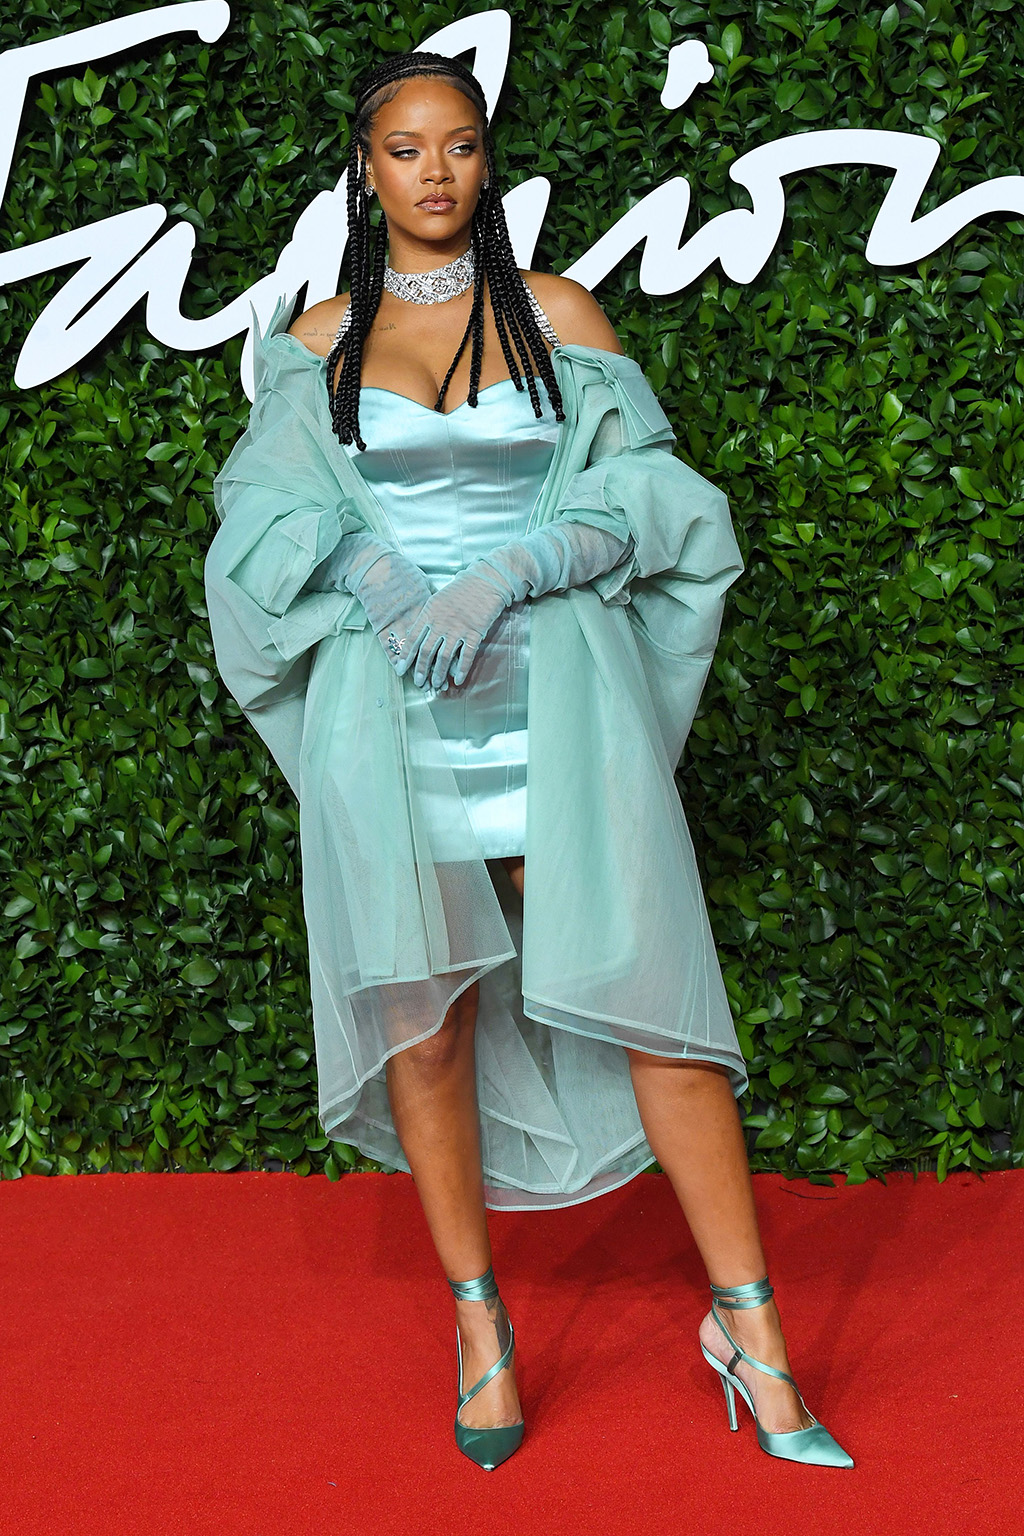 Rihanna, fenty, silk dress, wrap jacket, satin pumps, date night pumps, stilettos, red carpet, The Fashion Awards, Arrivals, Royal Albert Hall, London, UK - 02 Dec 2019